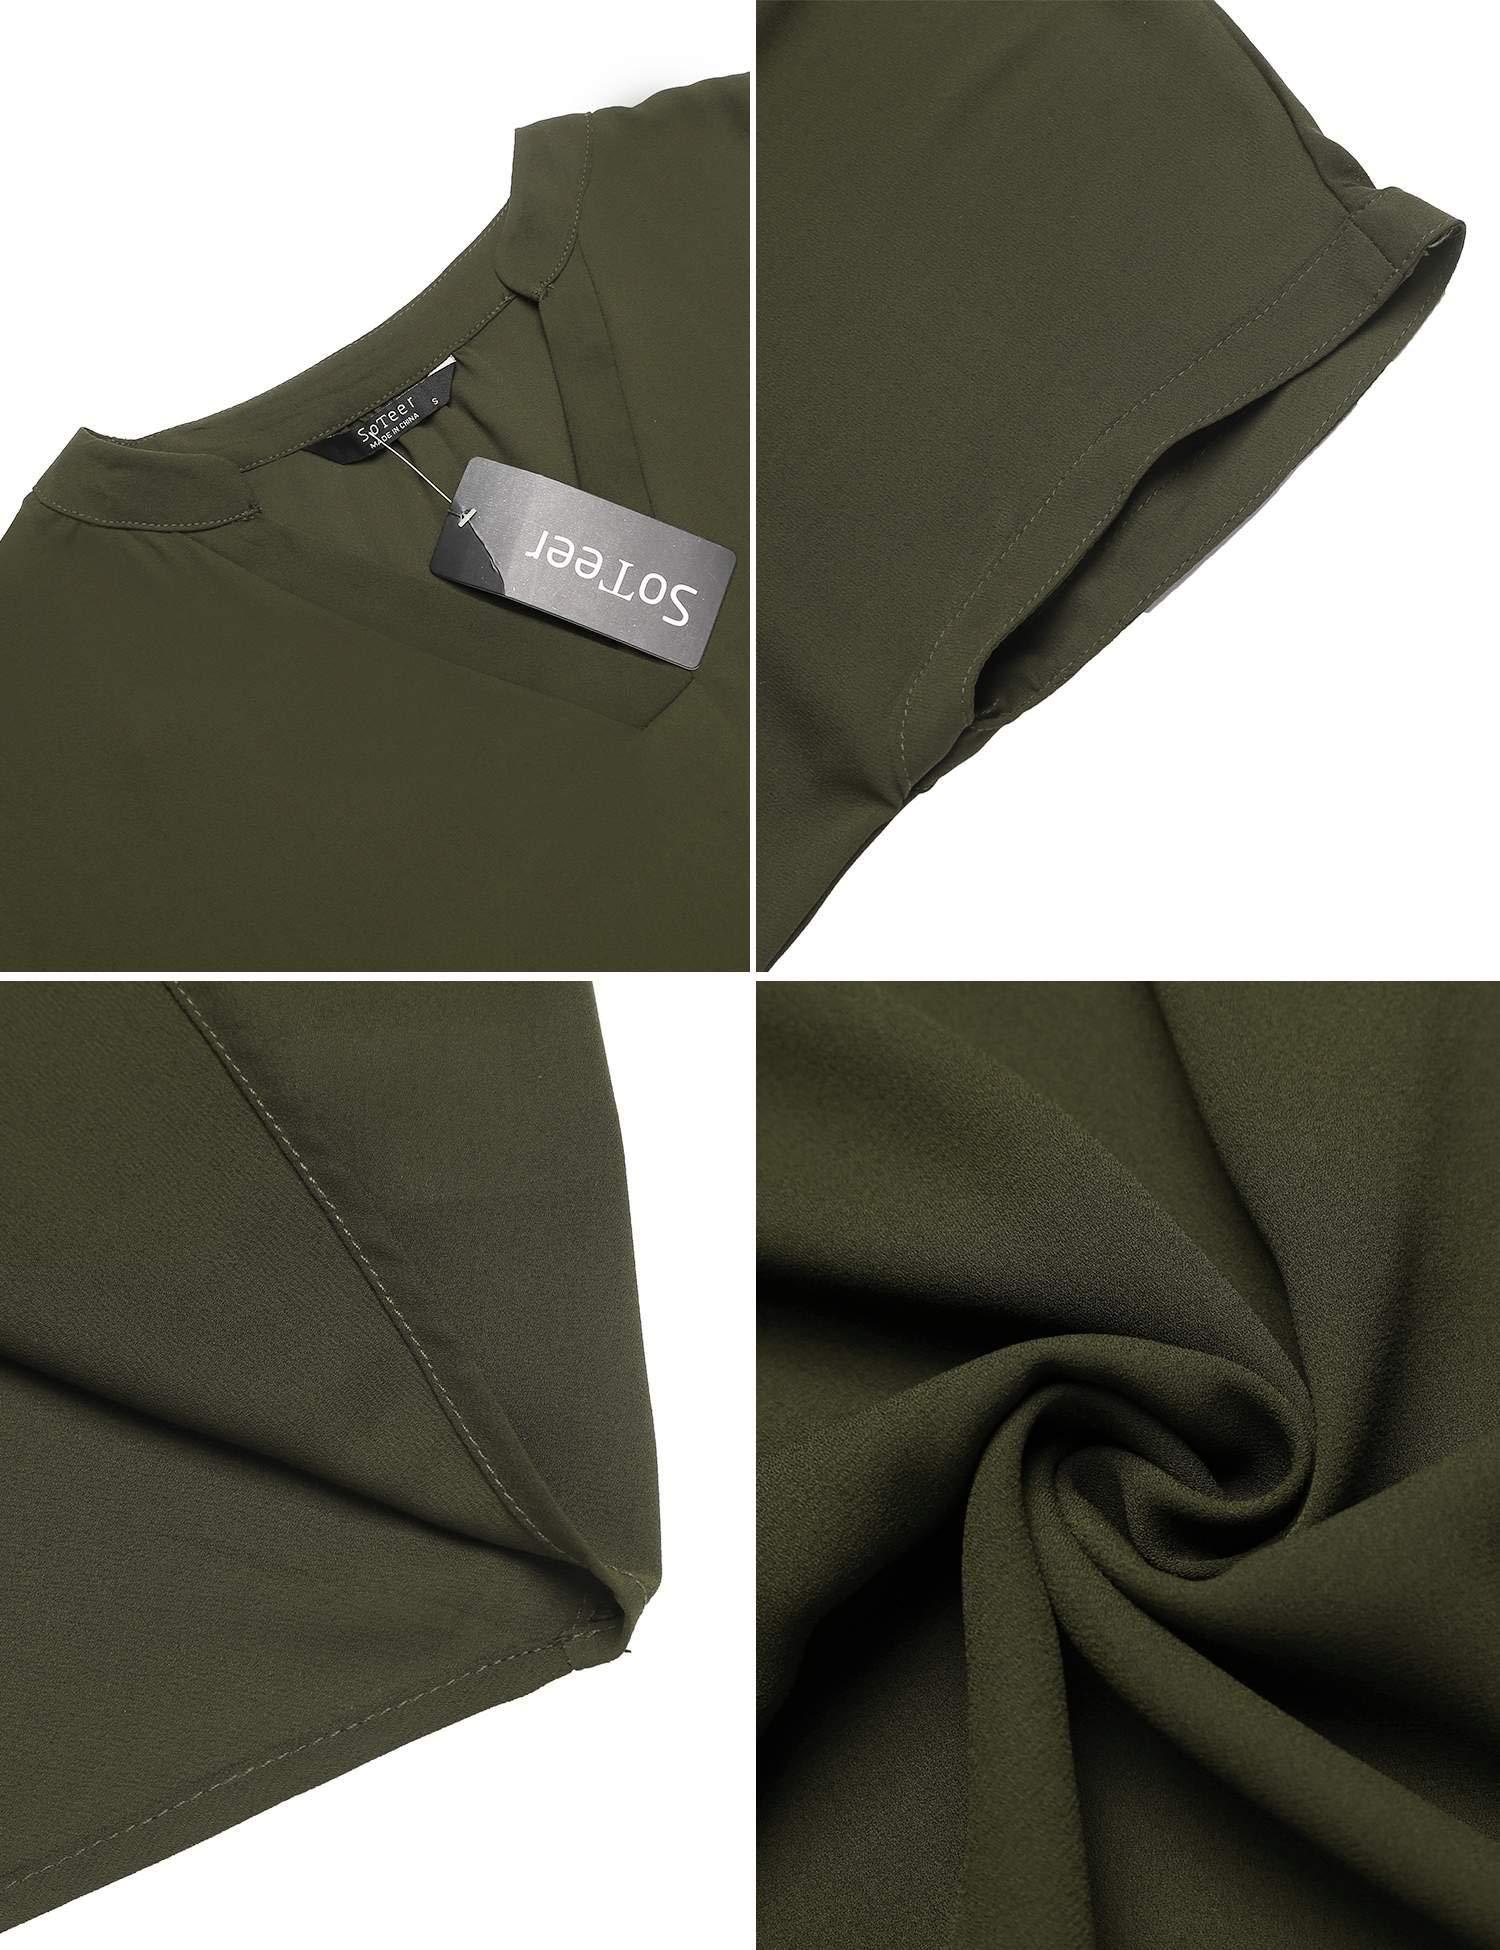 SUNAELIA Women Chiffon Blouse V Neck Short Sleeve Casual Top Shirts for Summer Army Green